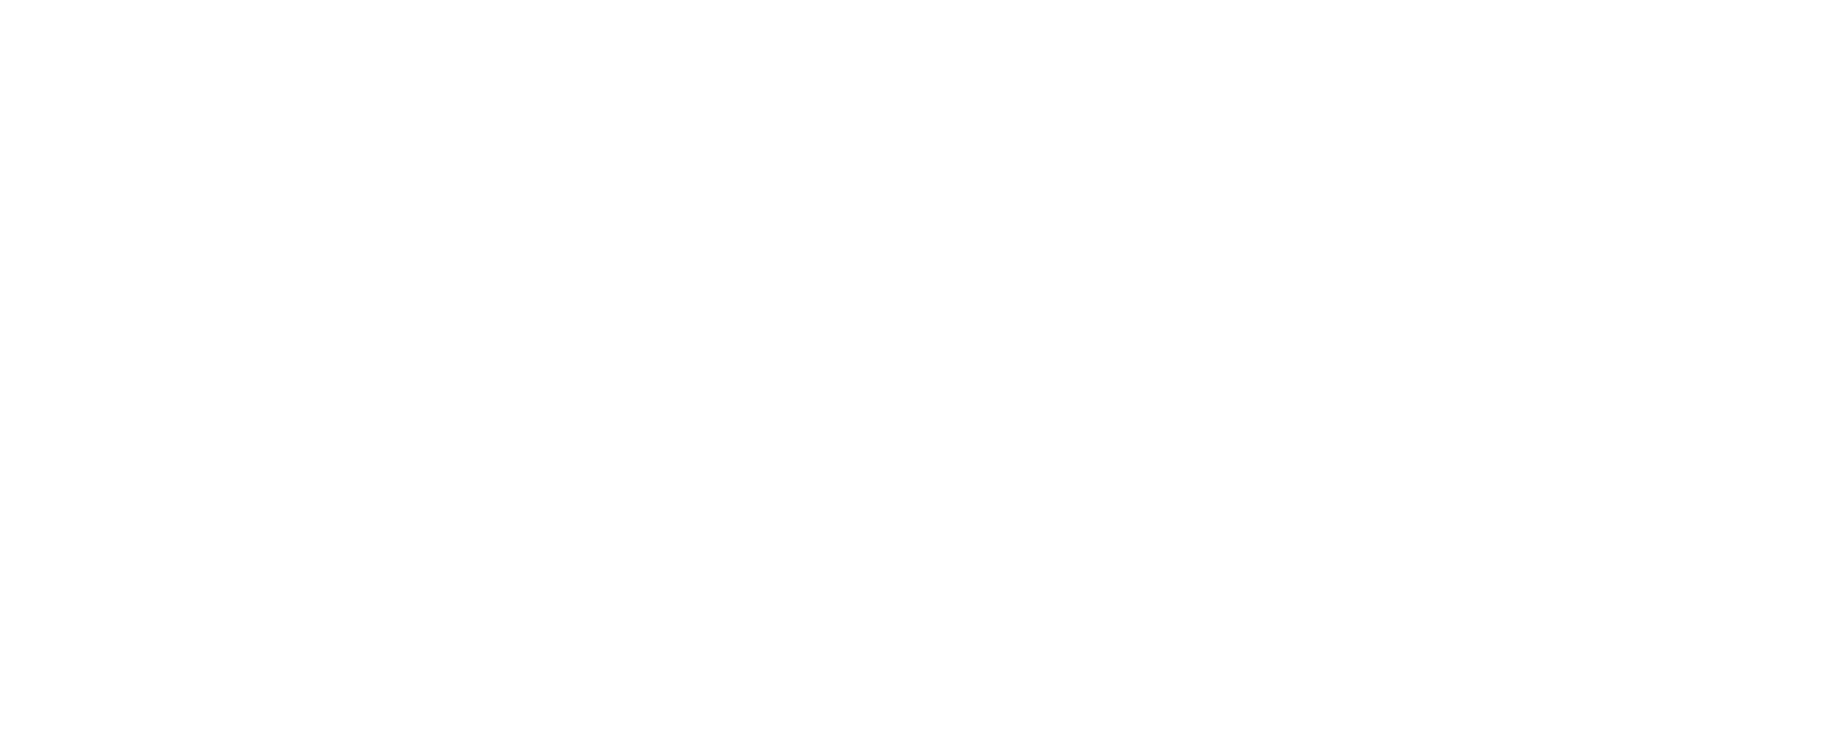 Mizuno Performance Center